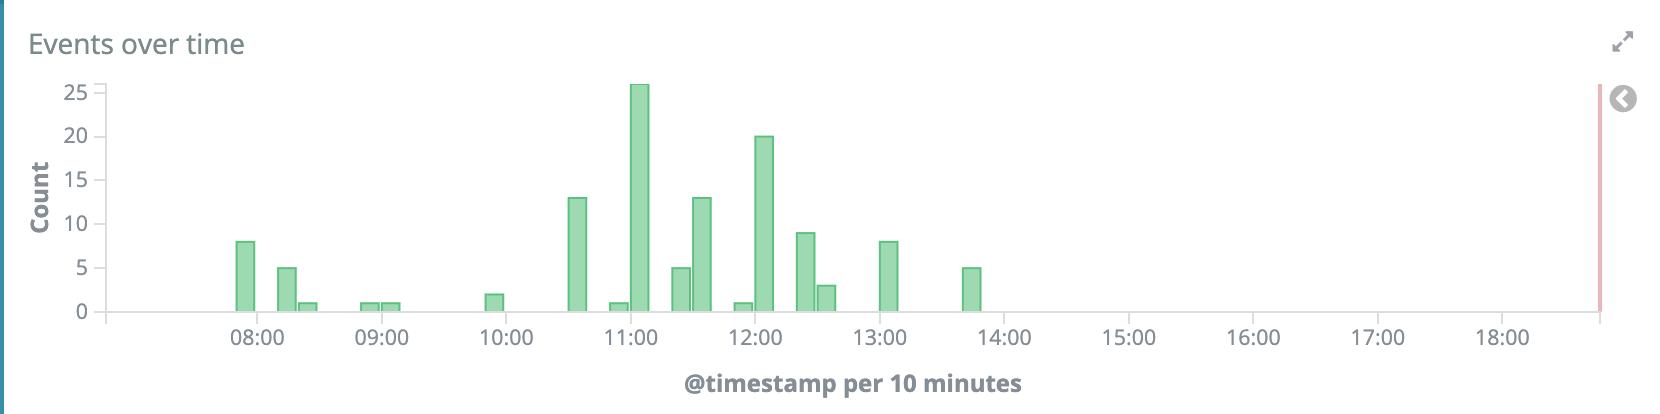 Screenshot 2020-03-05 at 18.47.40.png (414×1 px, 49 KB)